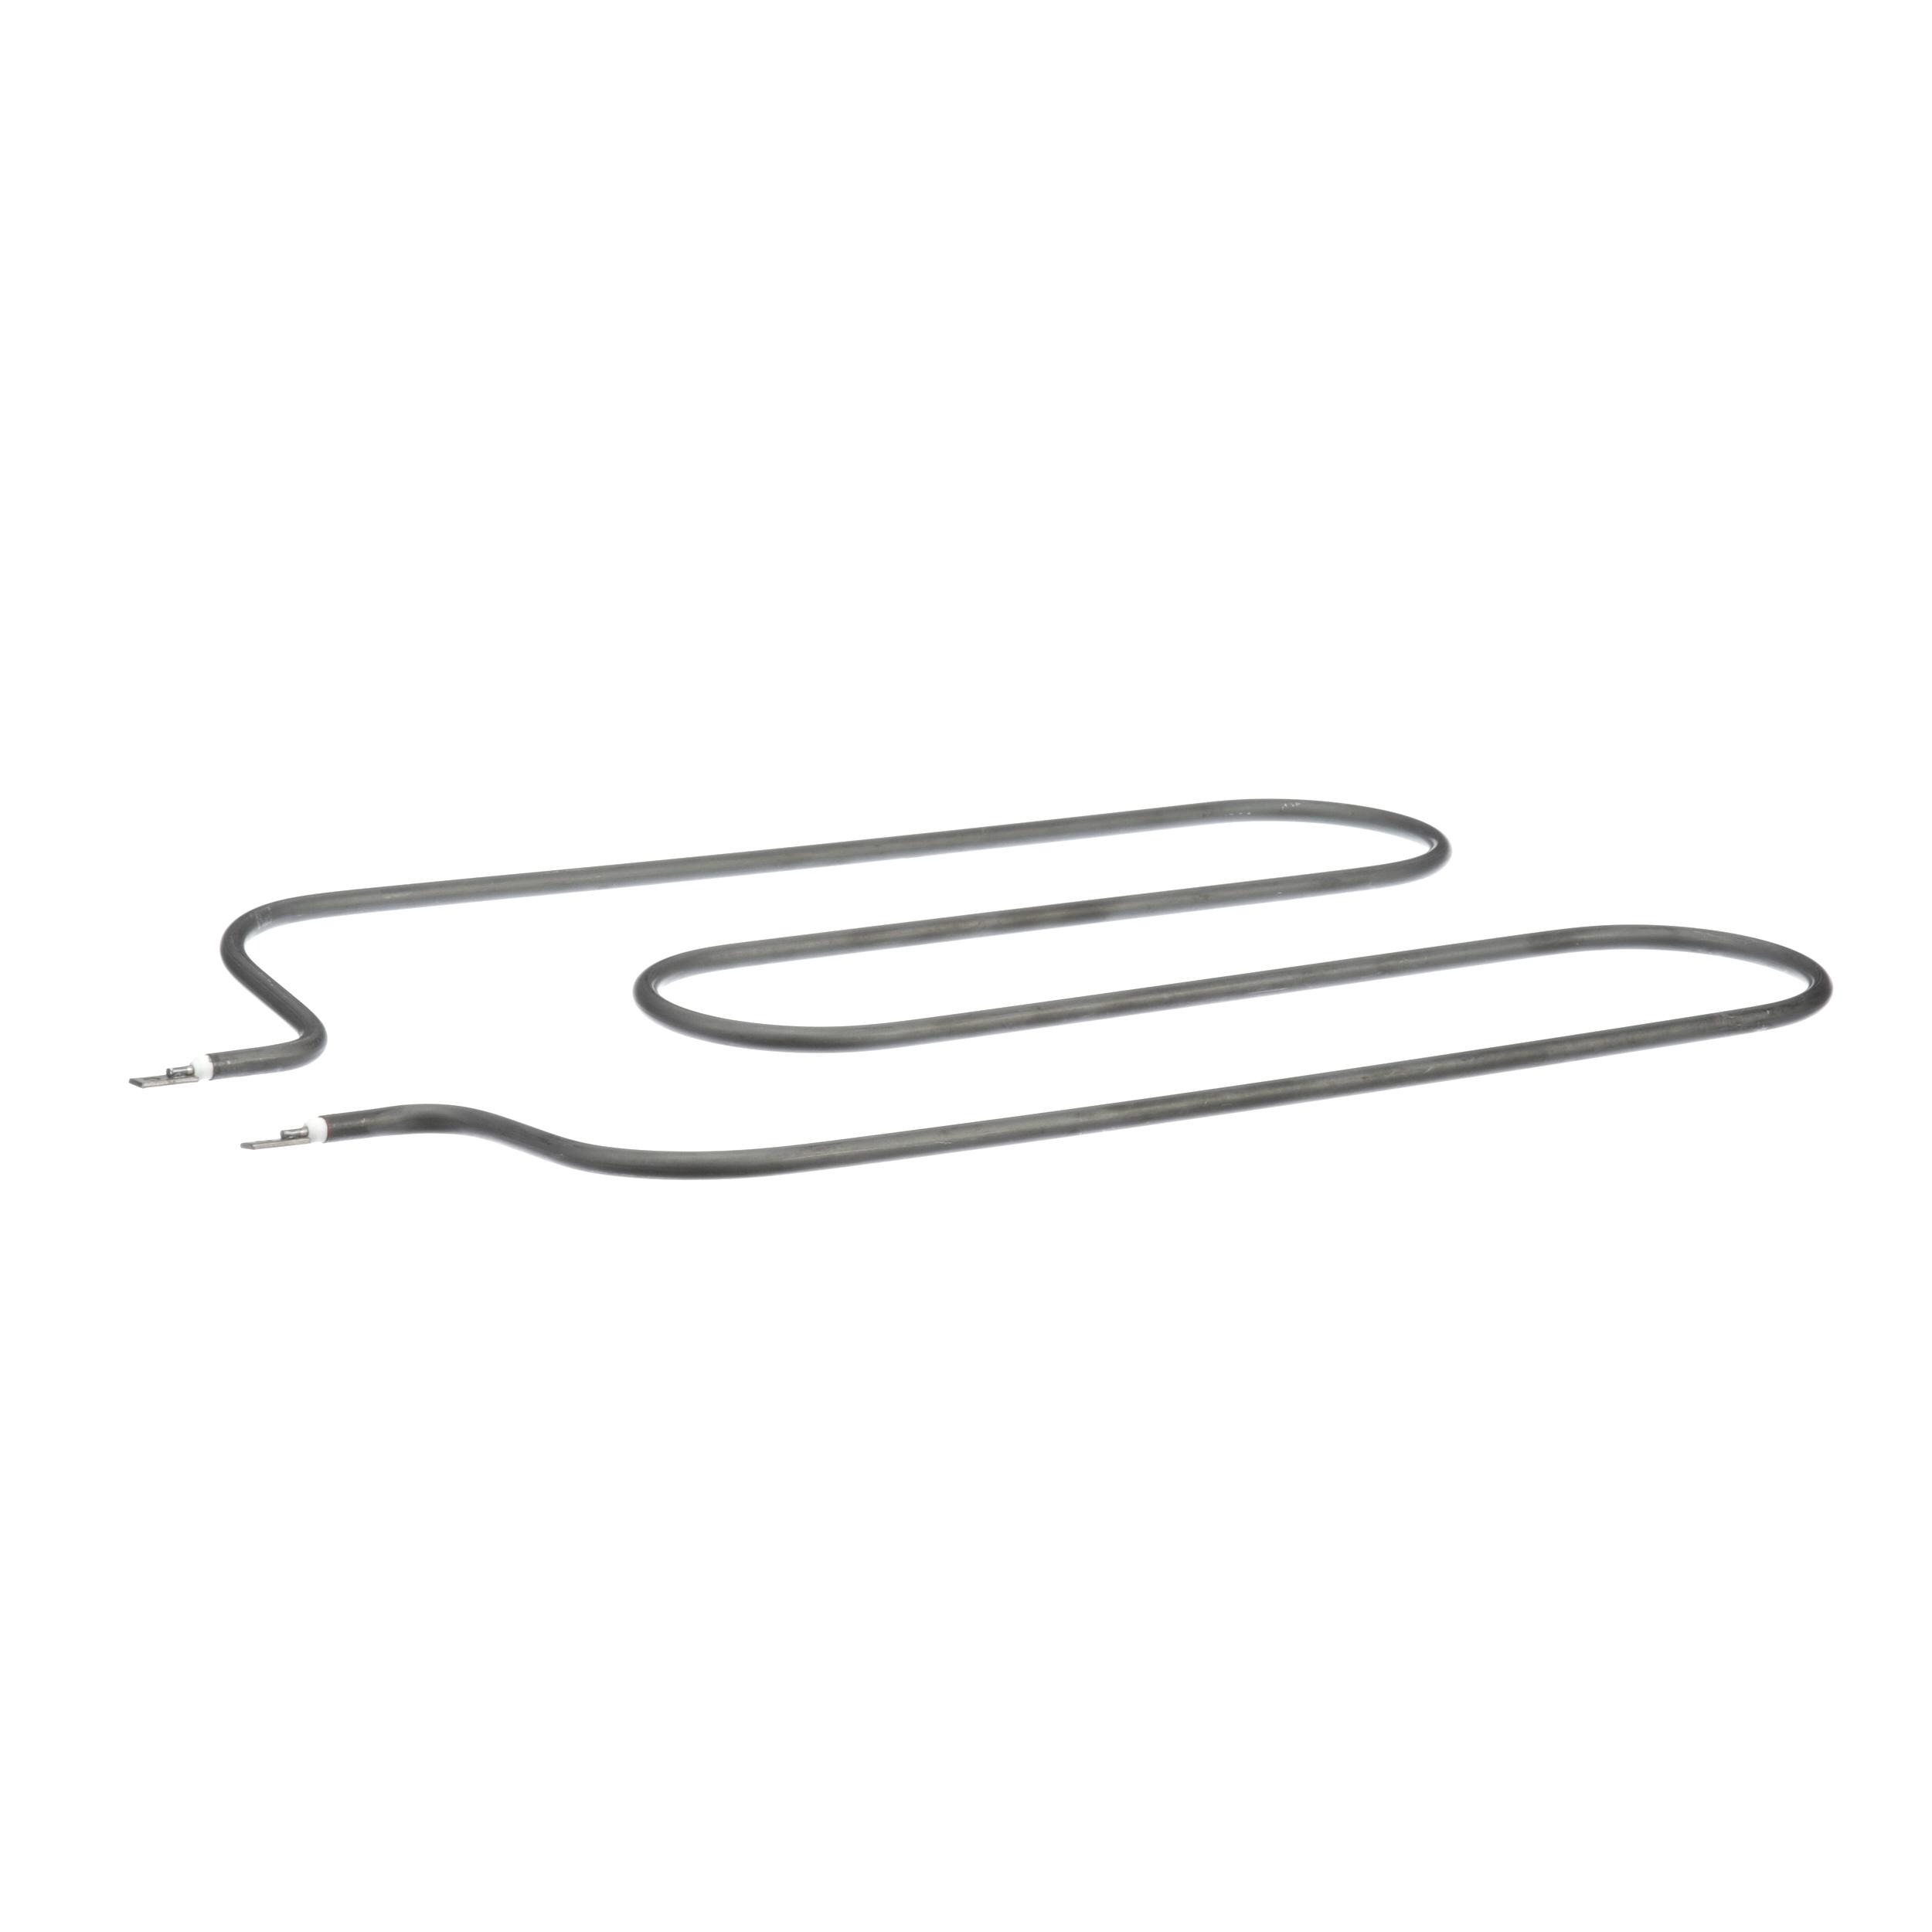 DUKE ELEMENT,120V 1200W CT WMR WELL, 250C